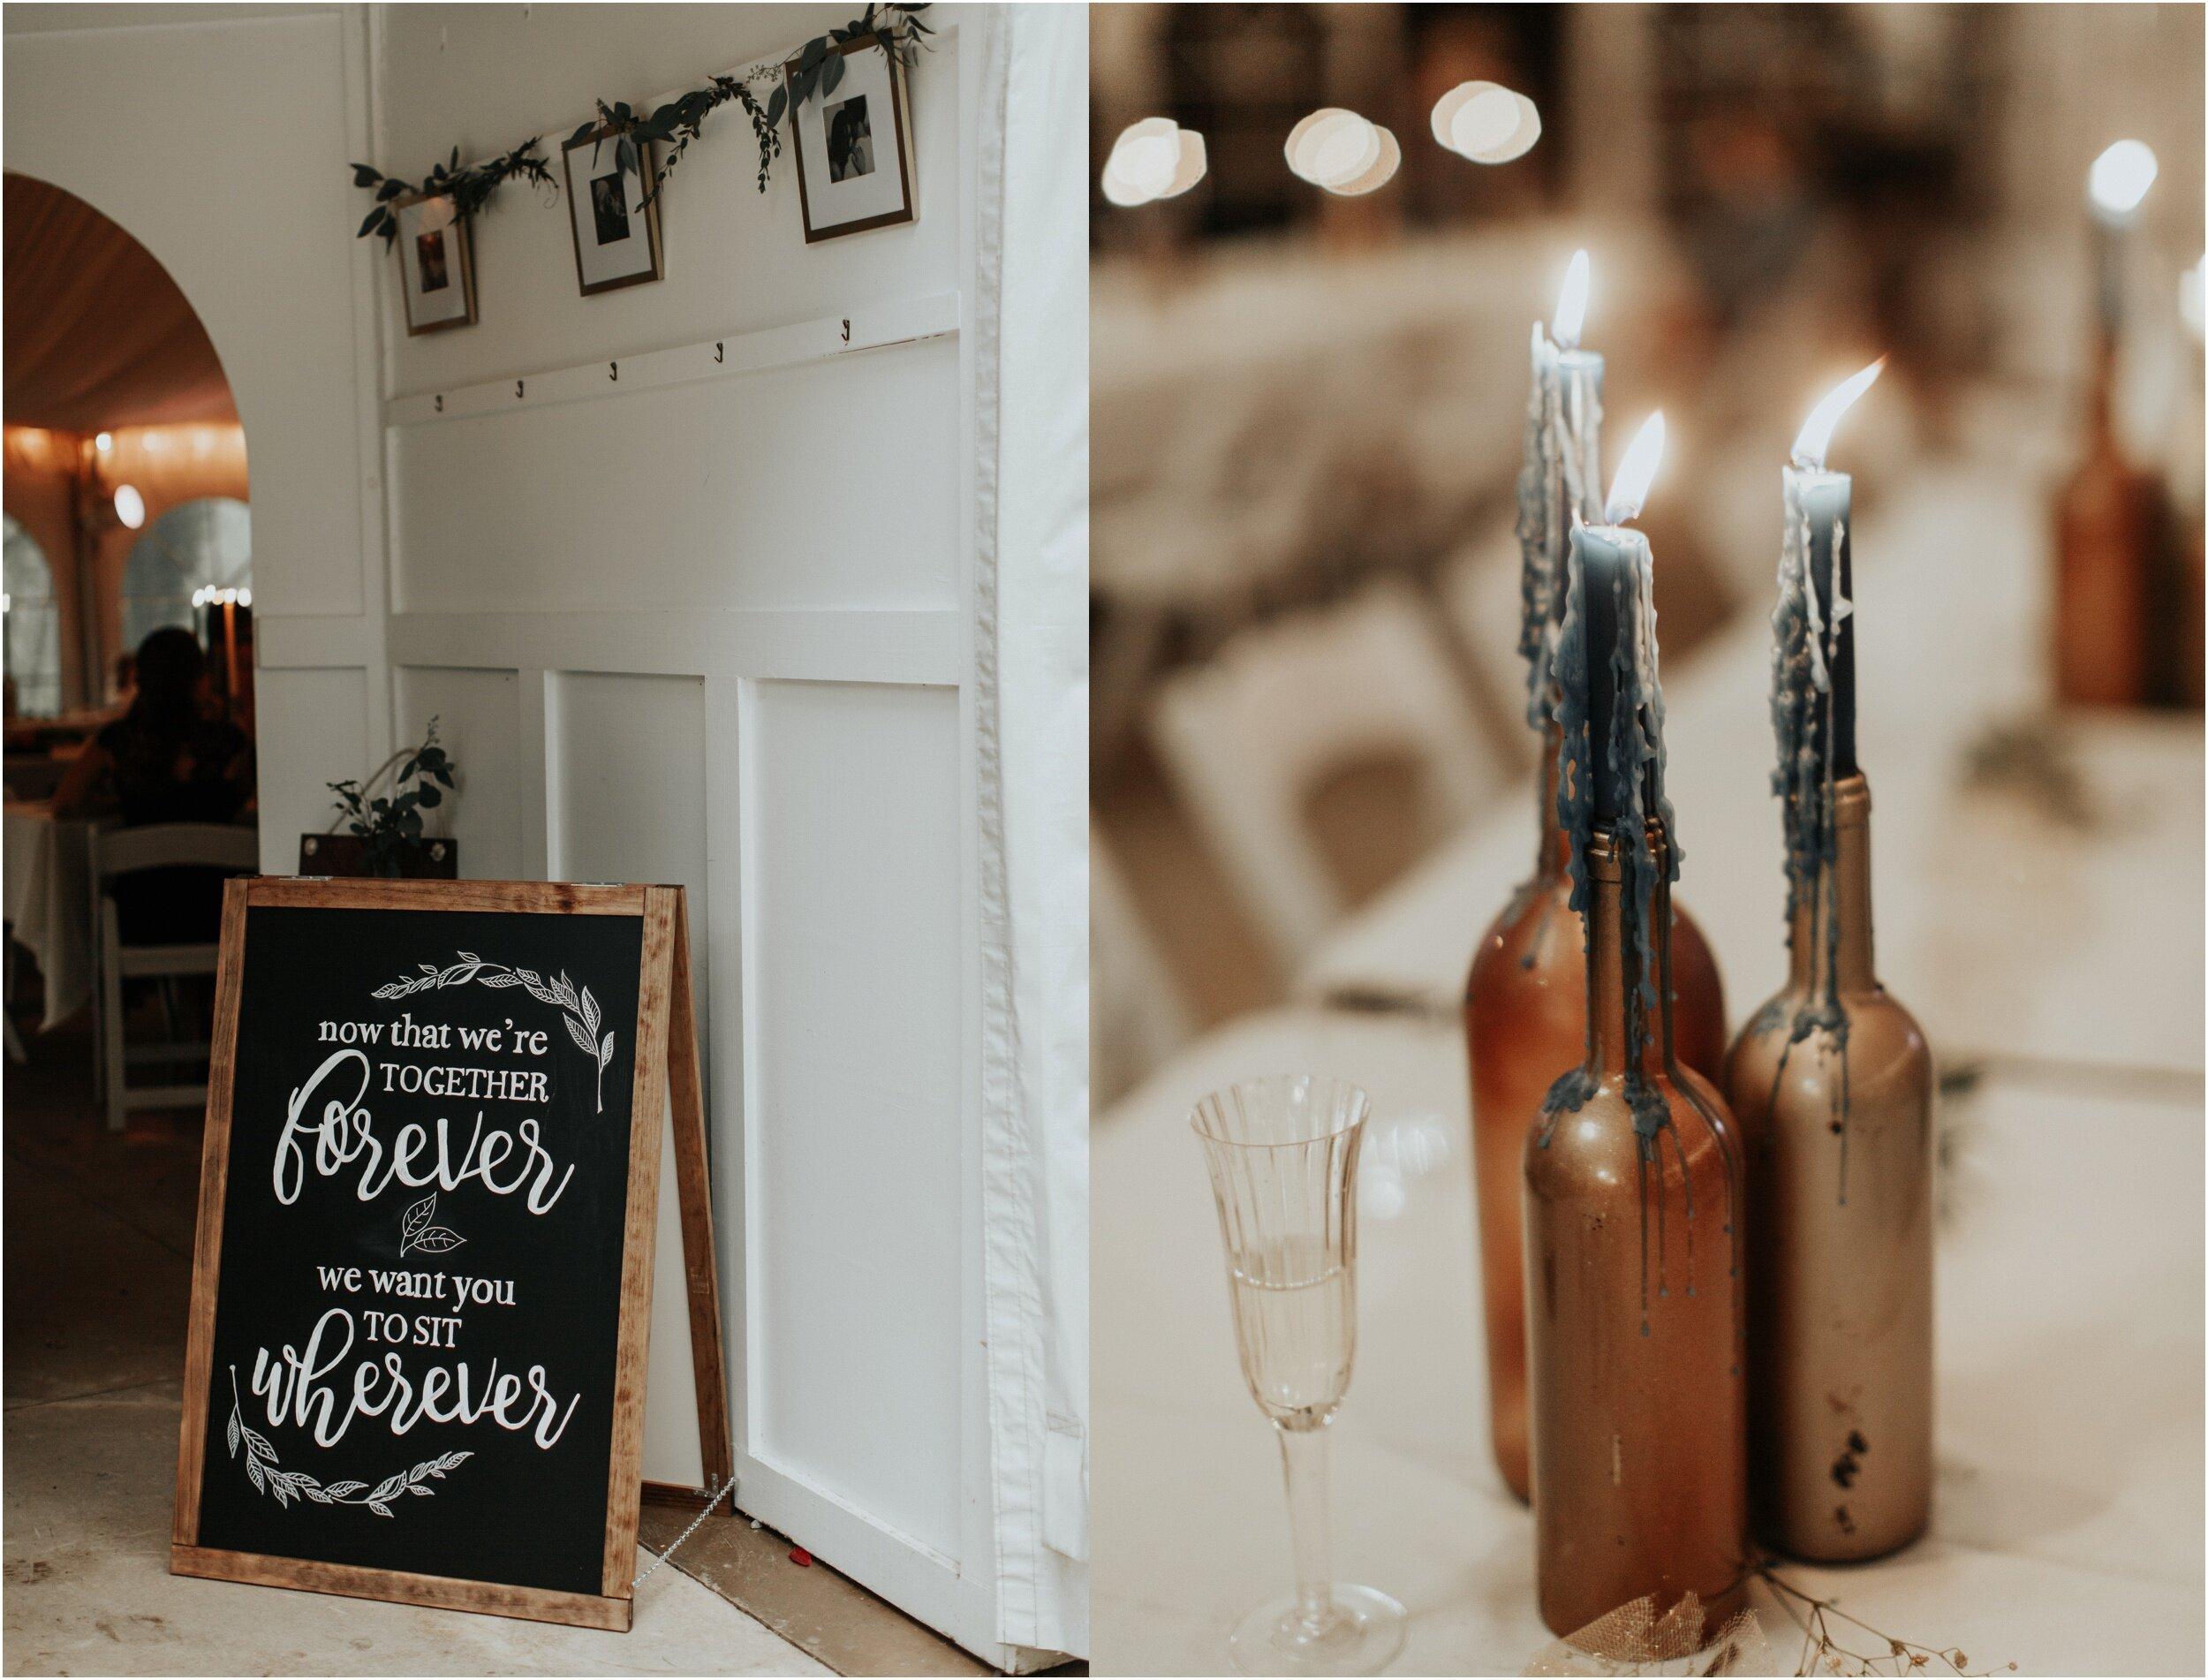 steph-and-jordan-cox-our-wedding-historic-shady-lane-compass-wedding-collective-hazel-lining-photography-destination-elopement-wedding-engagement-photography_0079.jpg